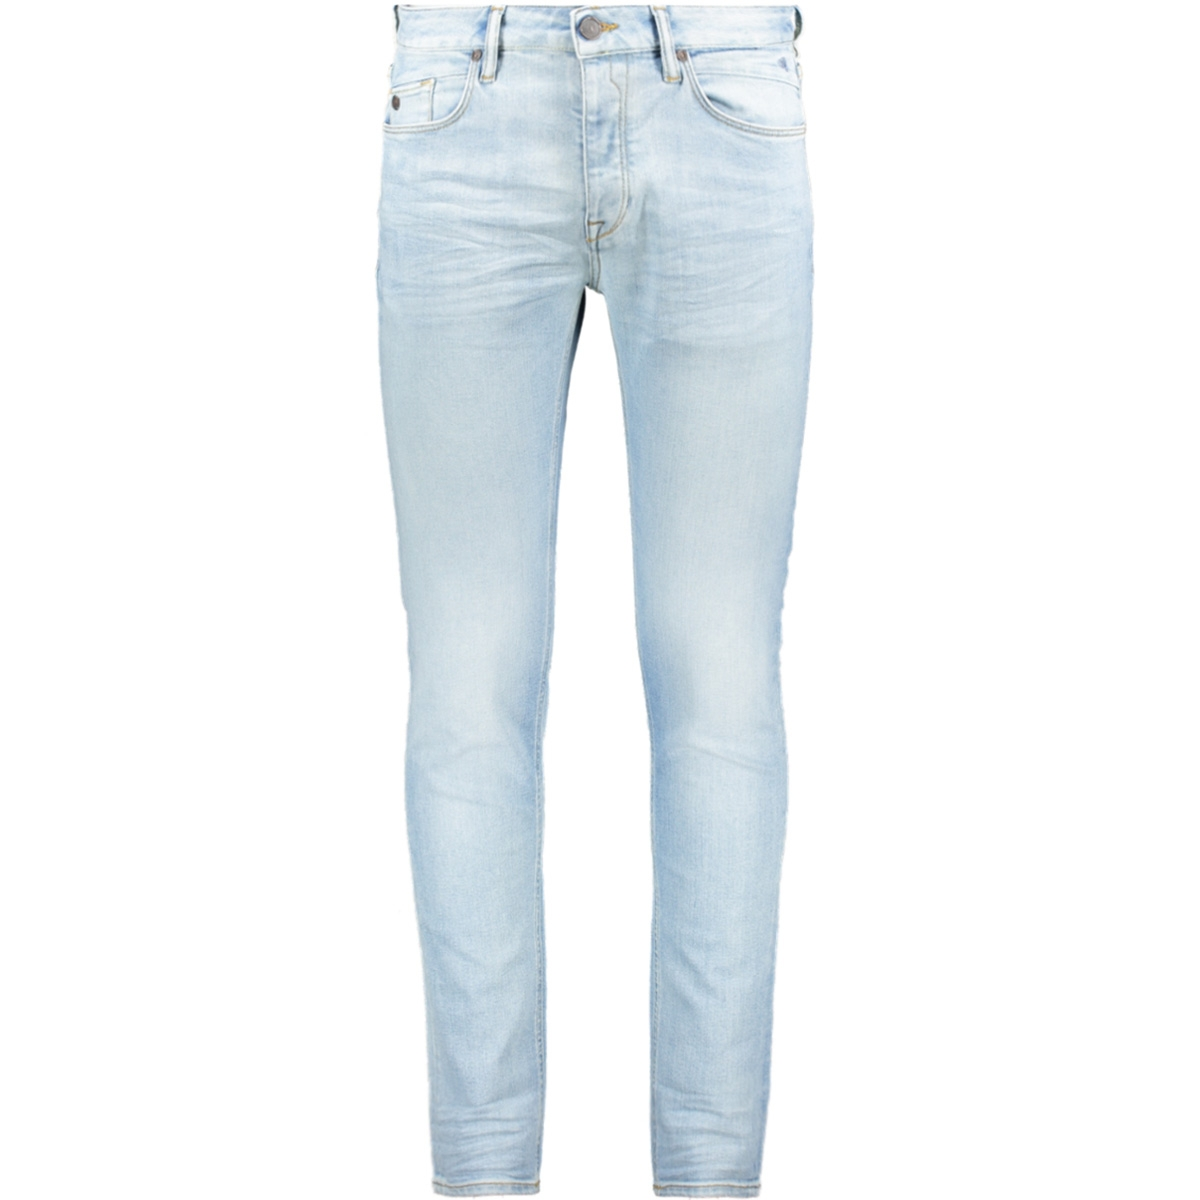 riser light wash denim ctr201212 lws cast iron jeans lws